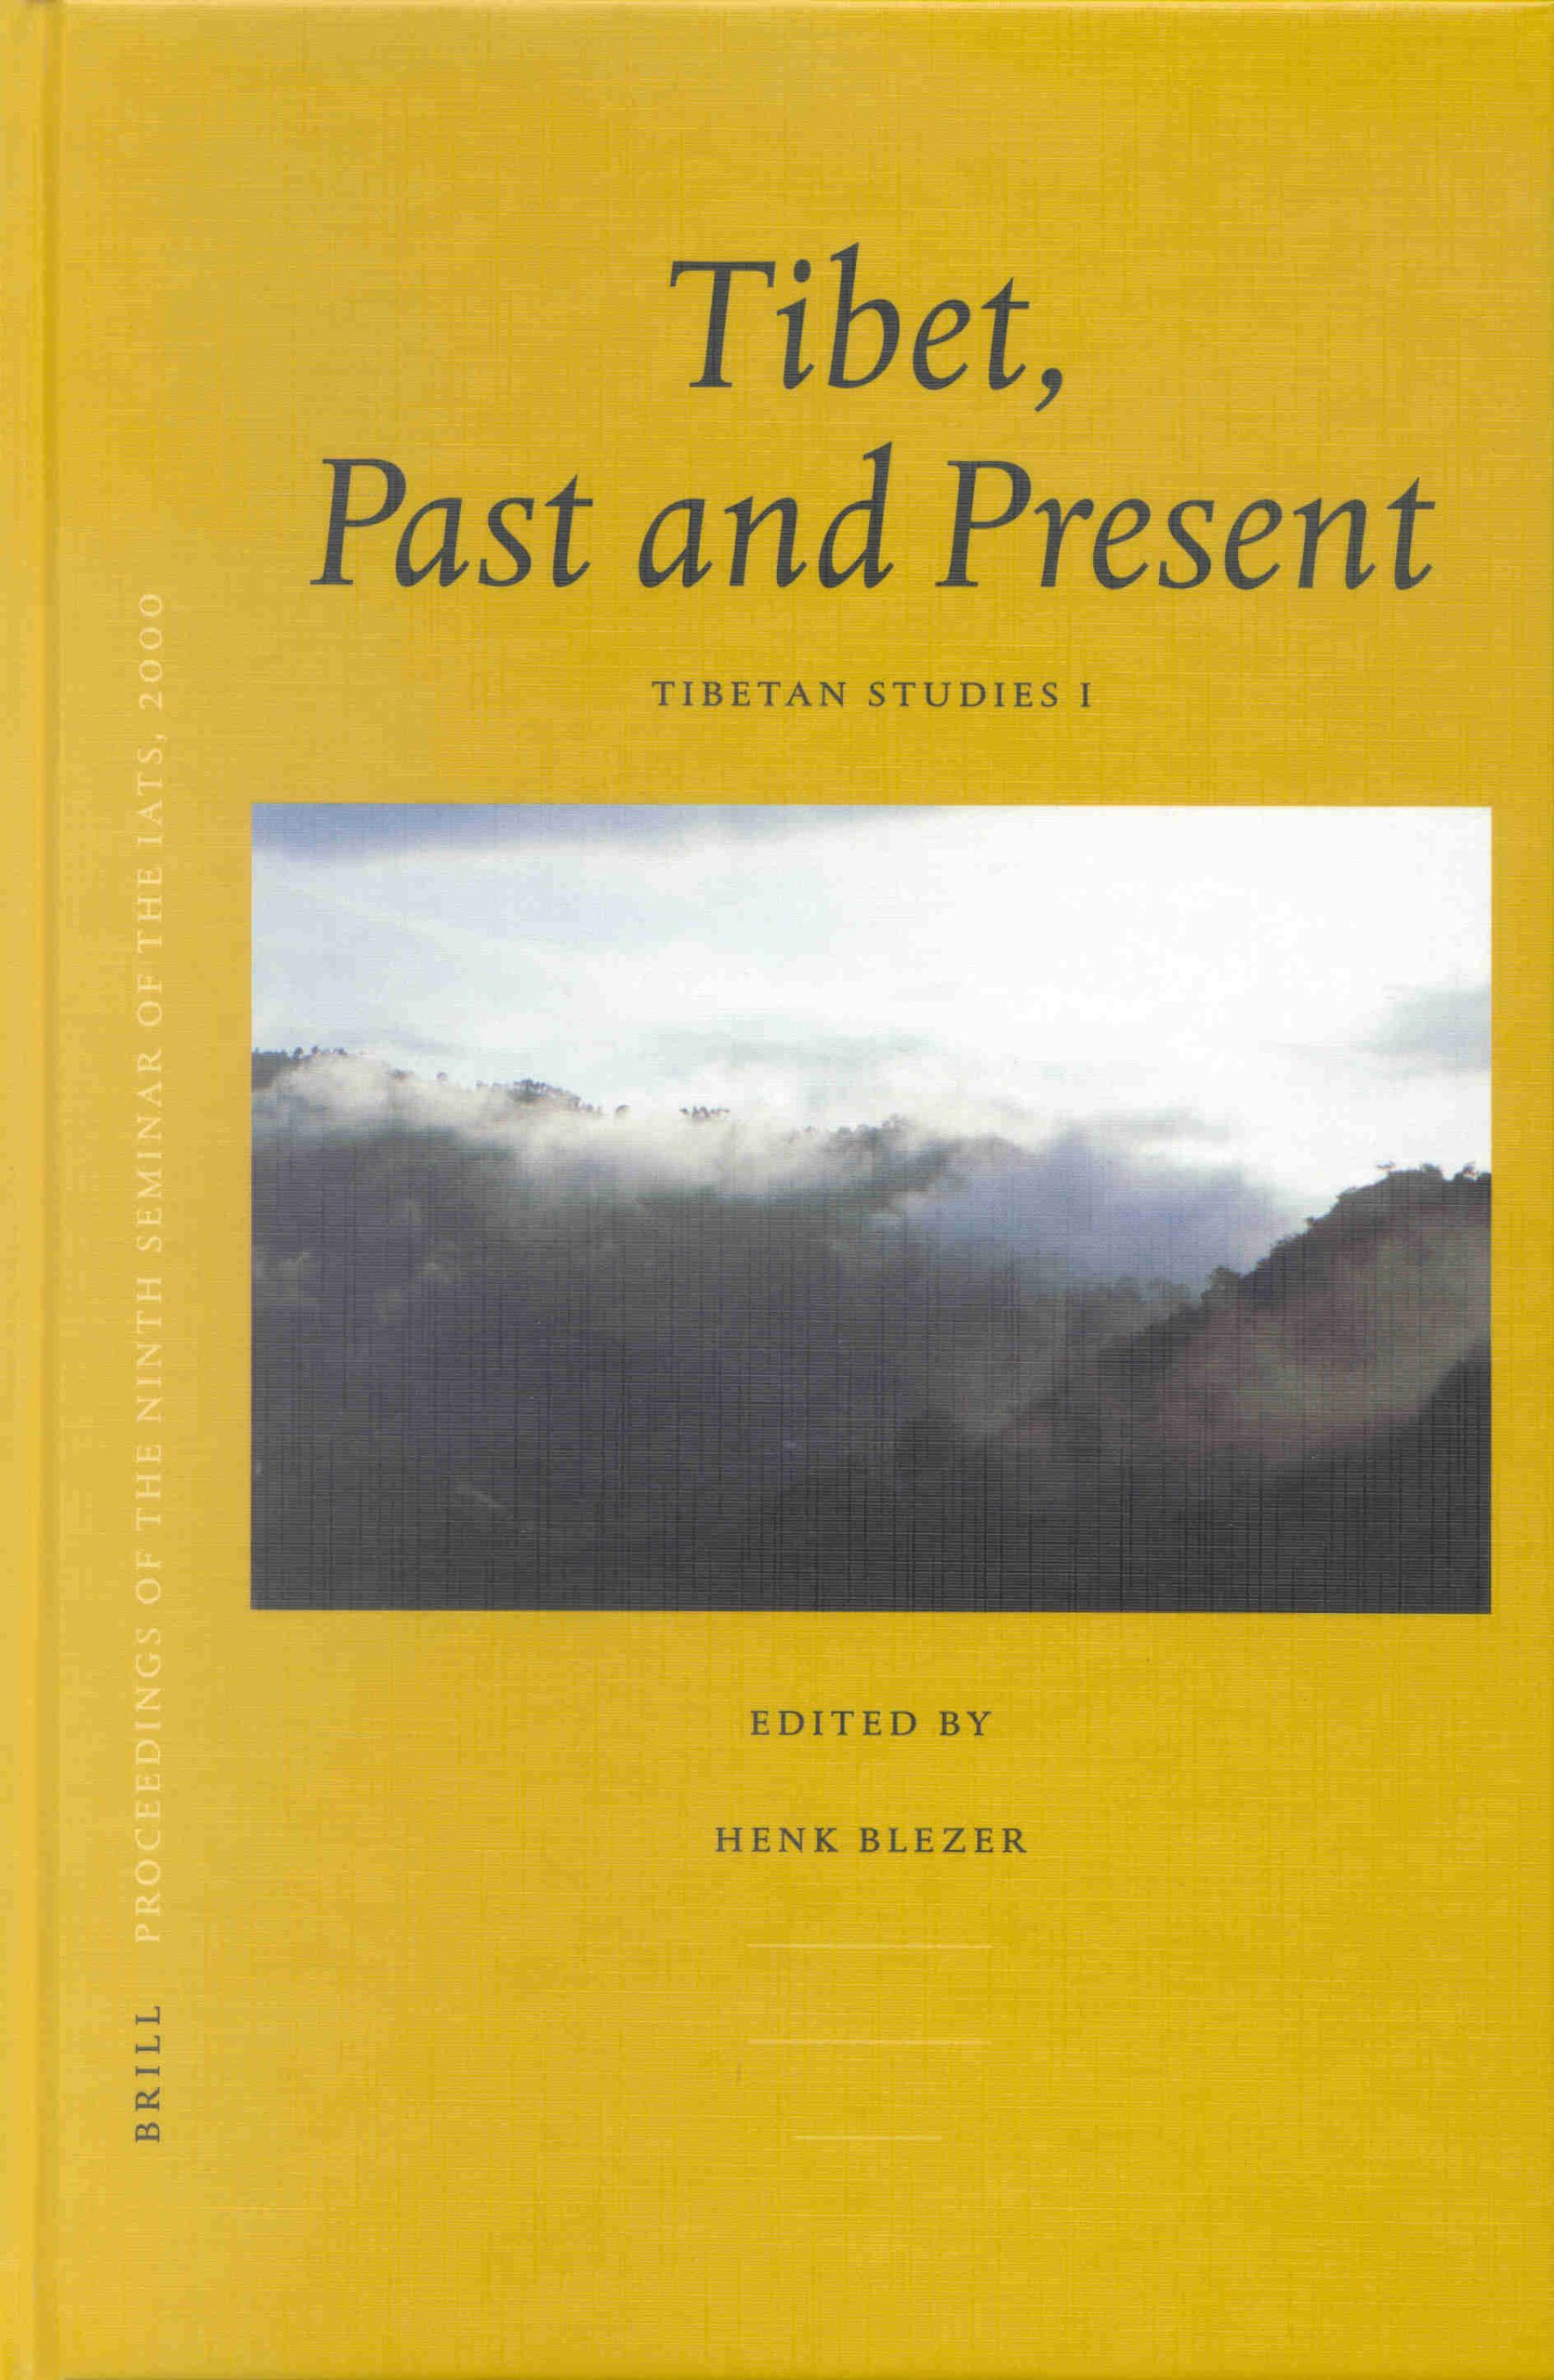 Download Tibet, Past and Present: Tibetan Studies I (Brill's Tibetan Studies Library) pdf epub